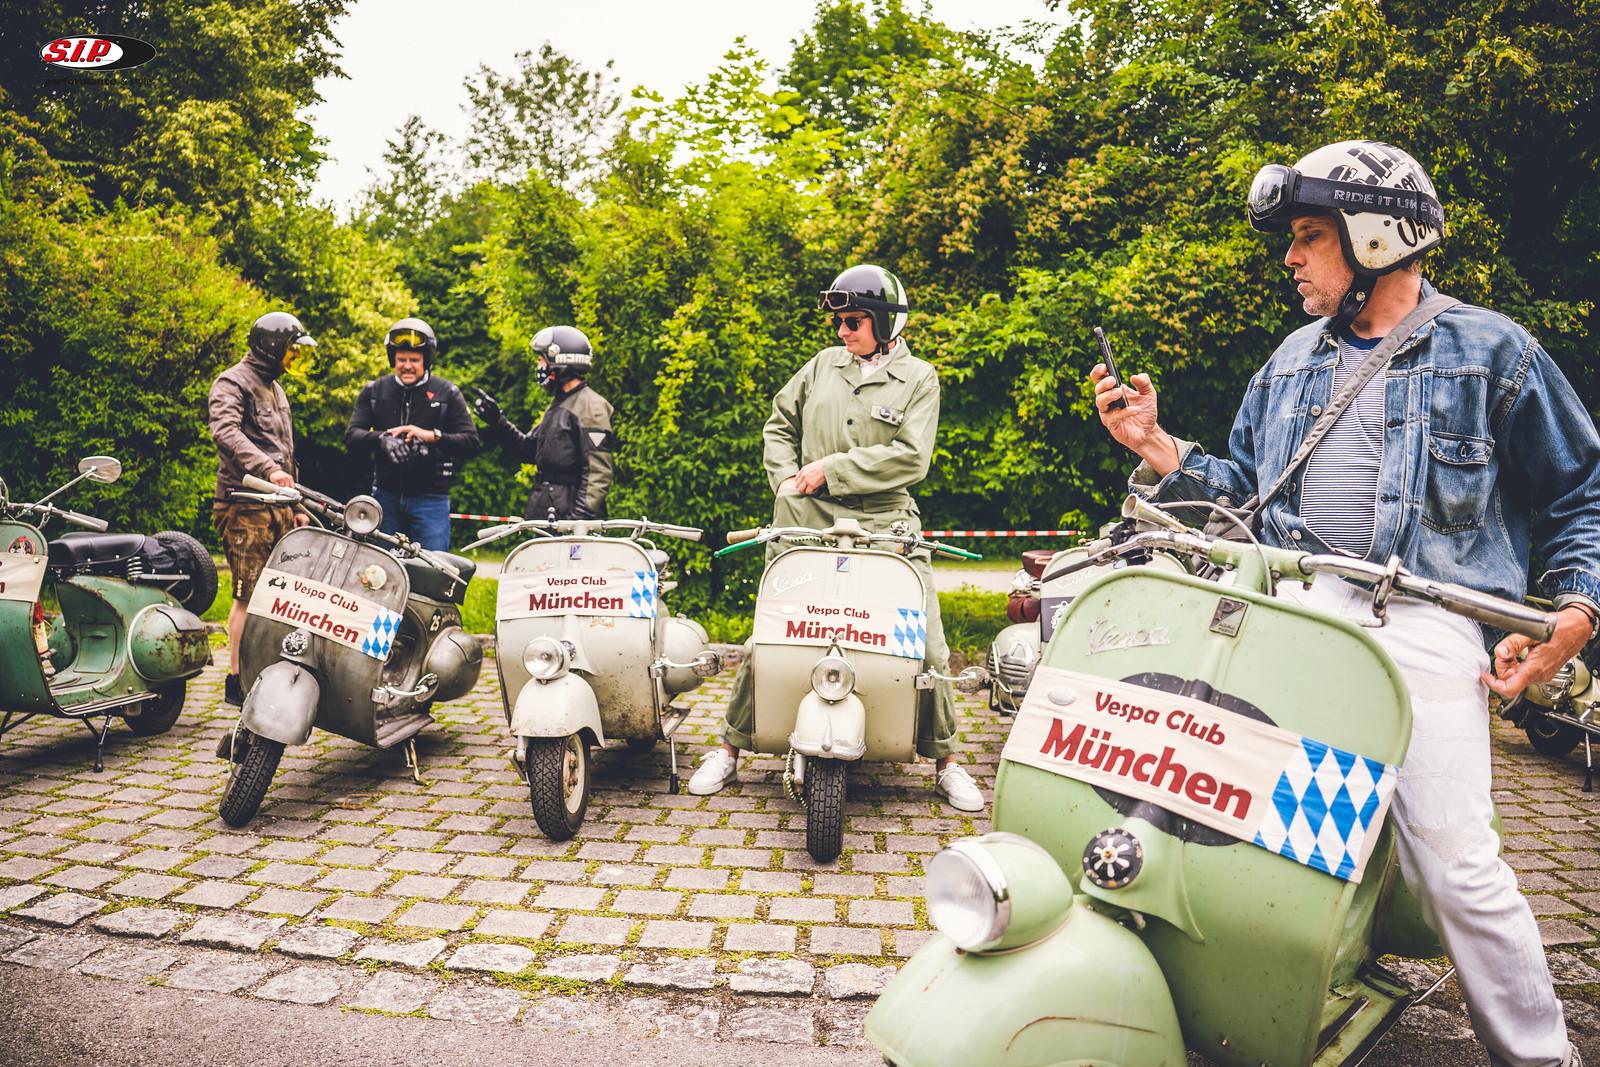 1. Vespa Rohrlenker Tour Vespa Club München